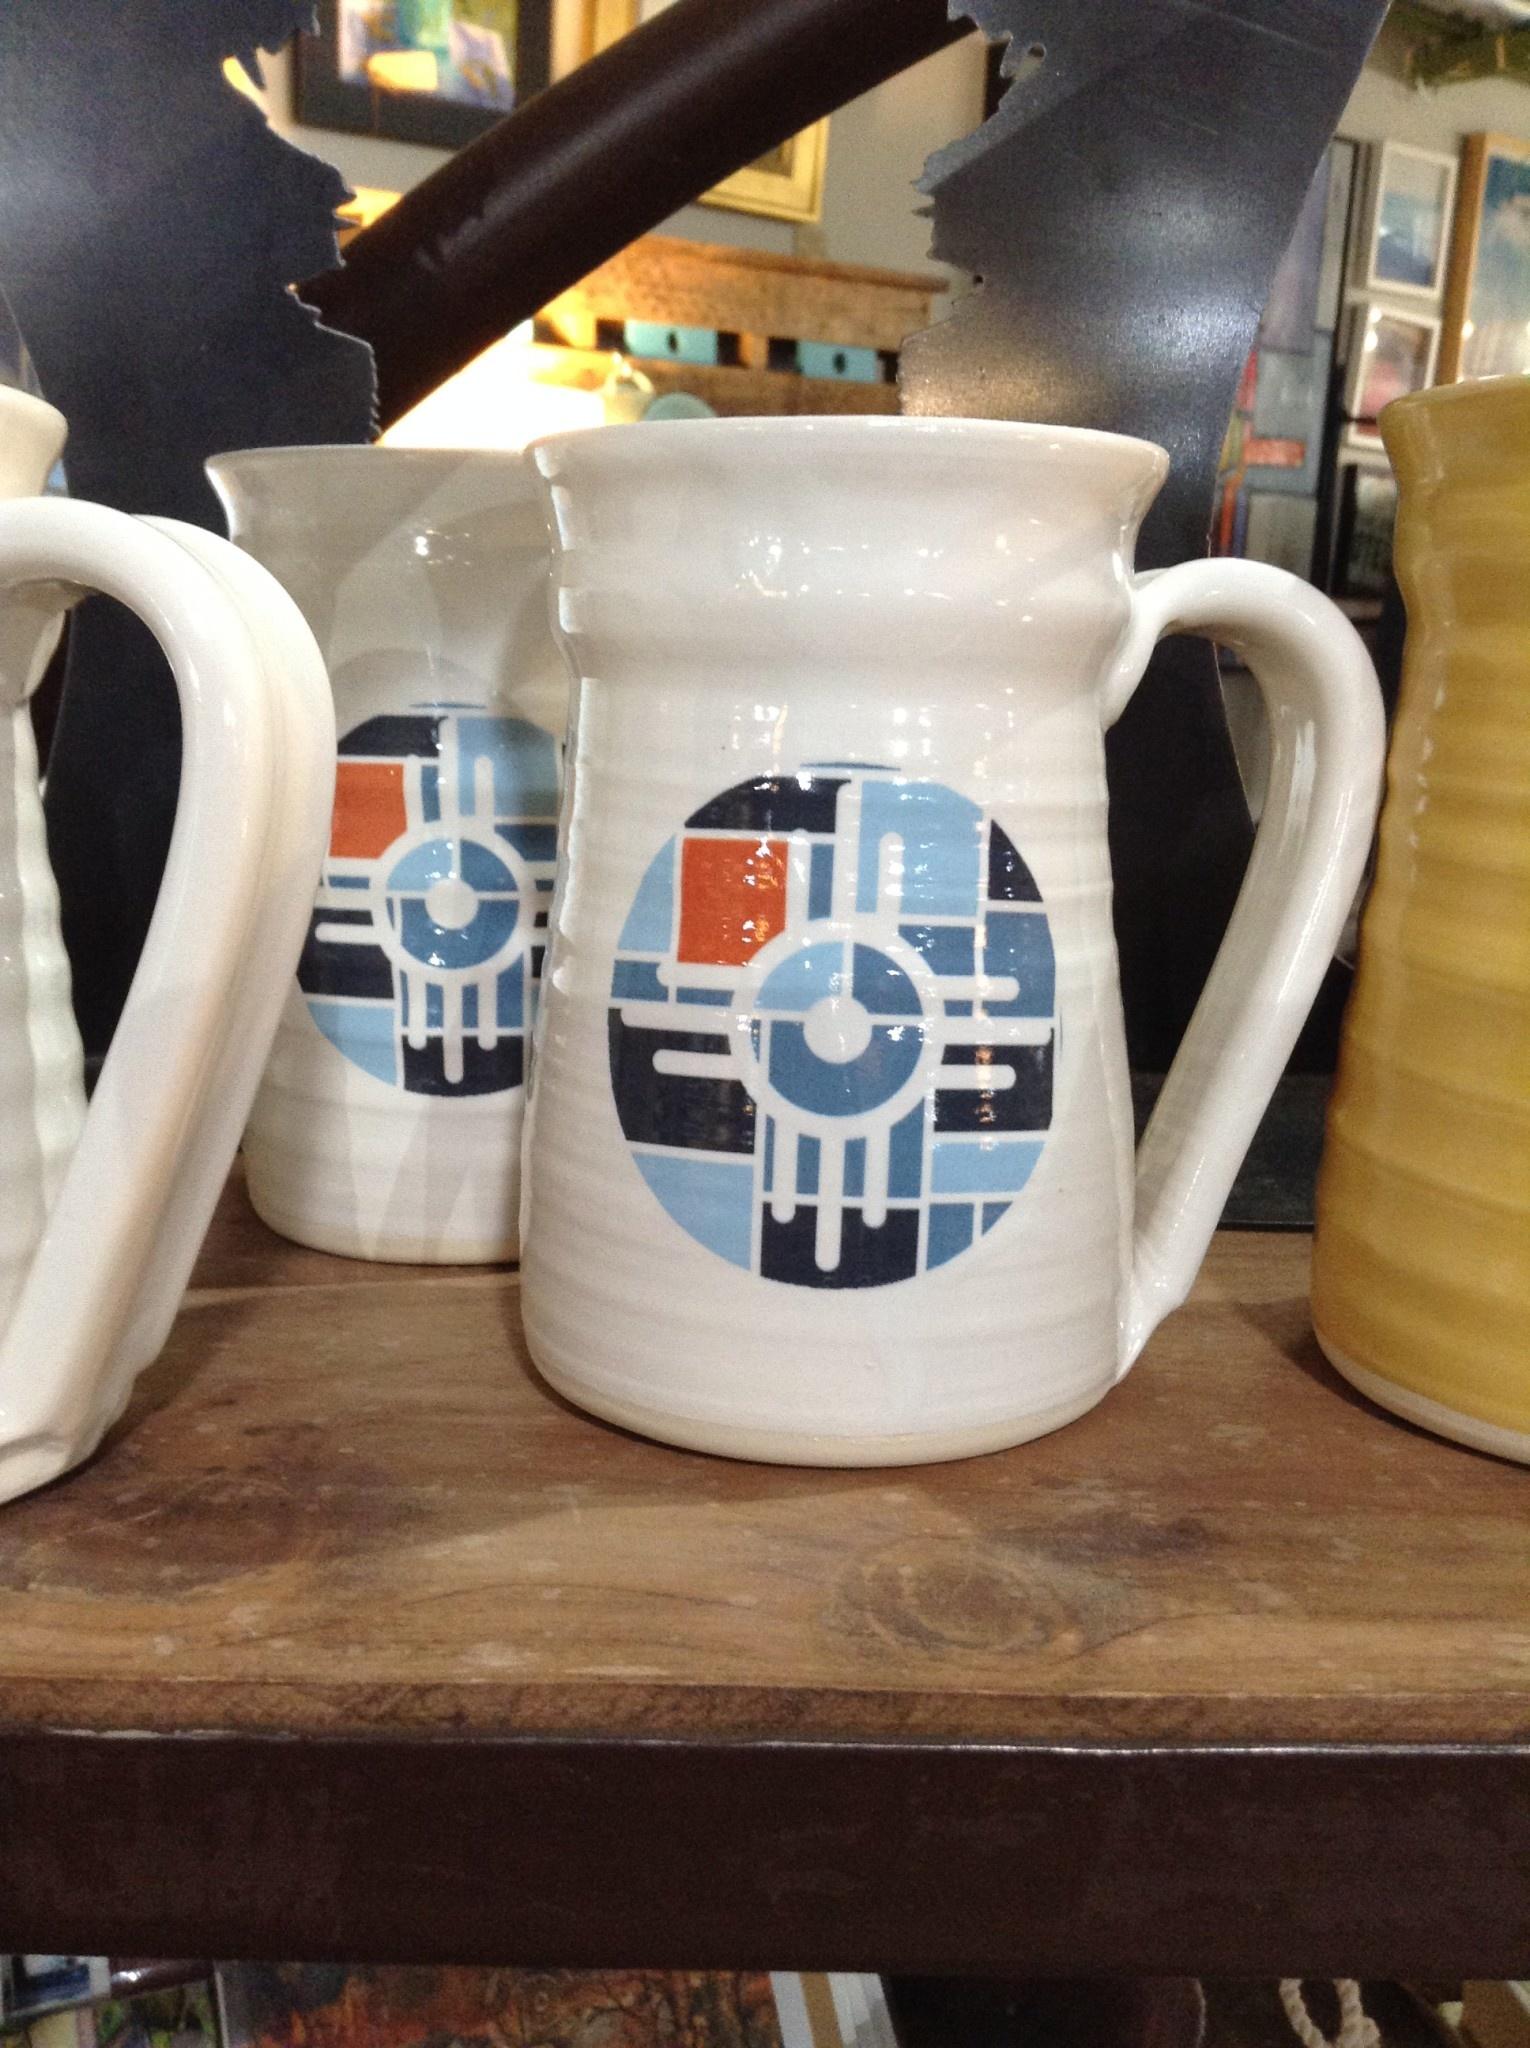 IS Art Handcrafted Ceramic Wichita Mug